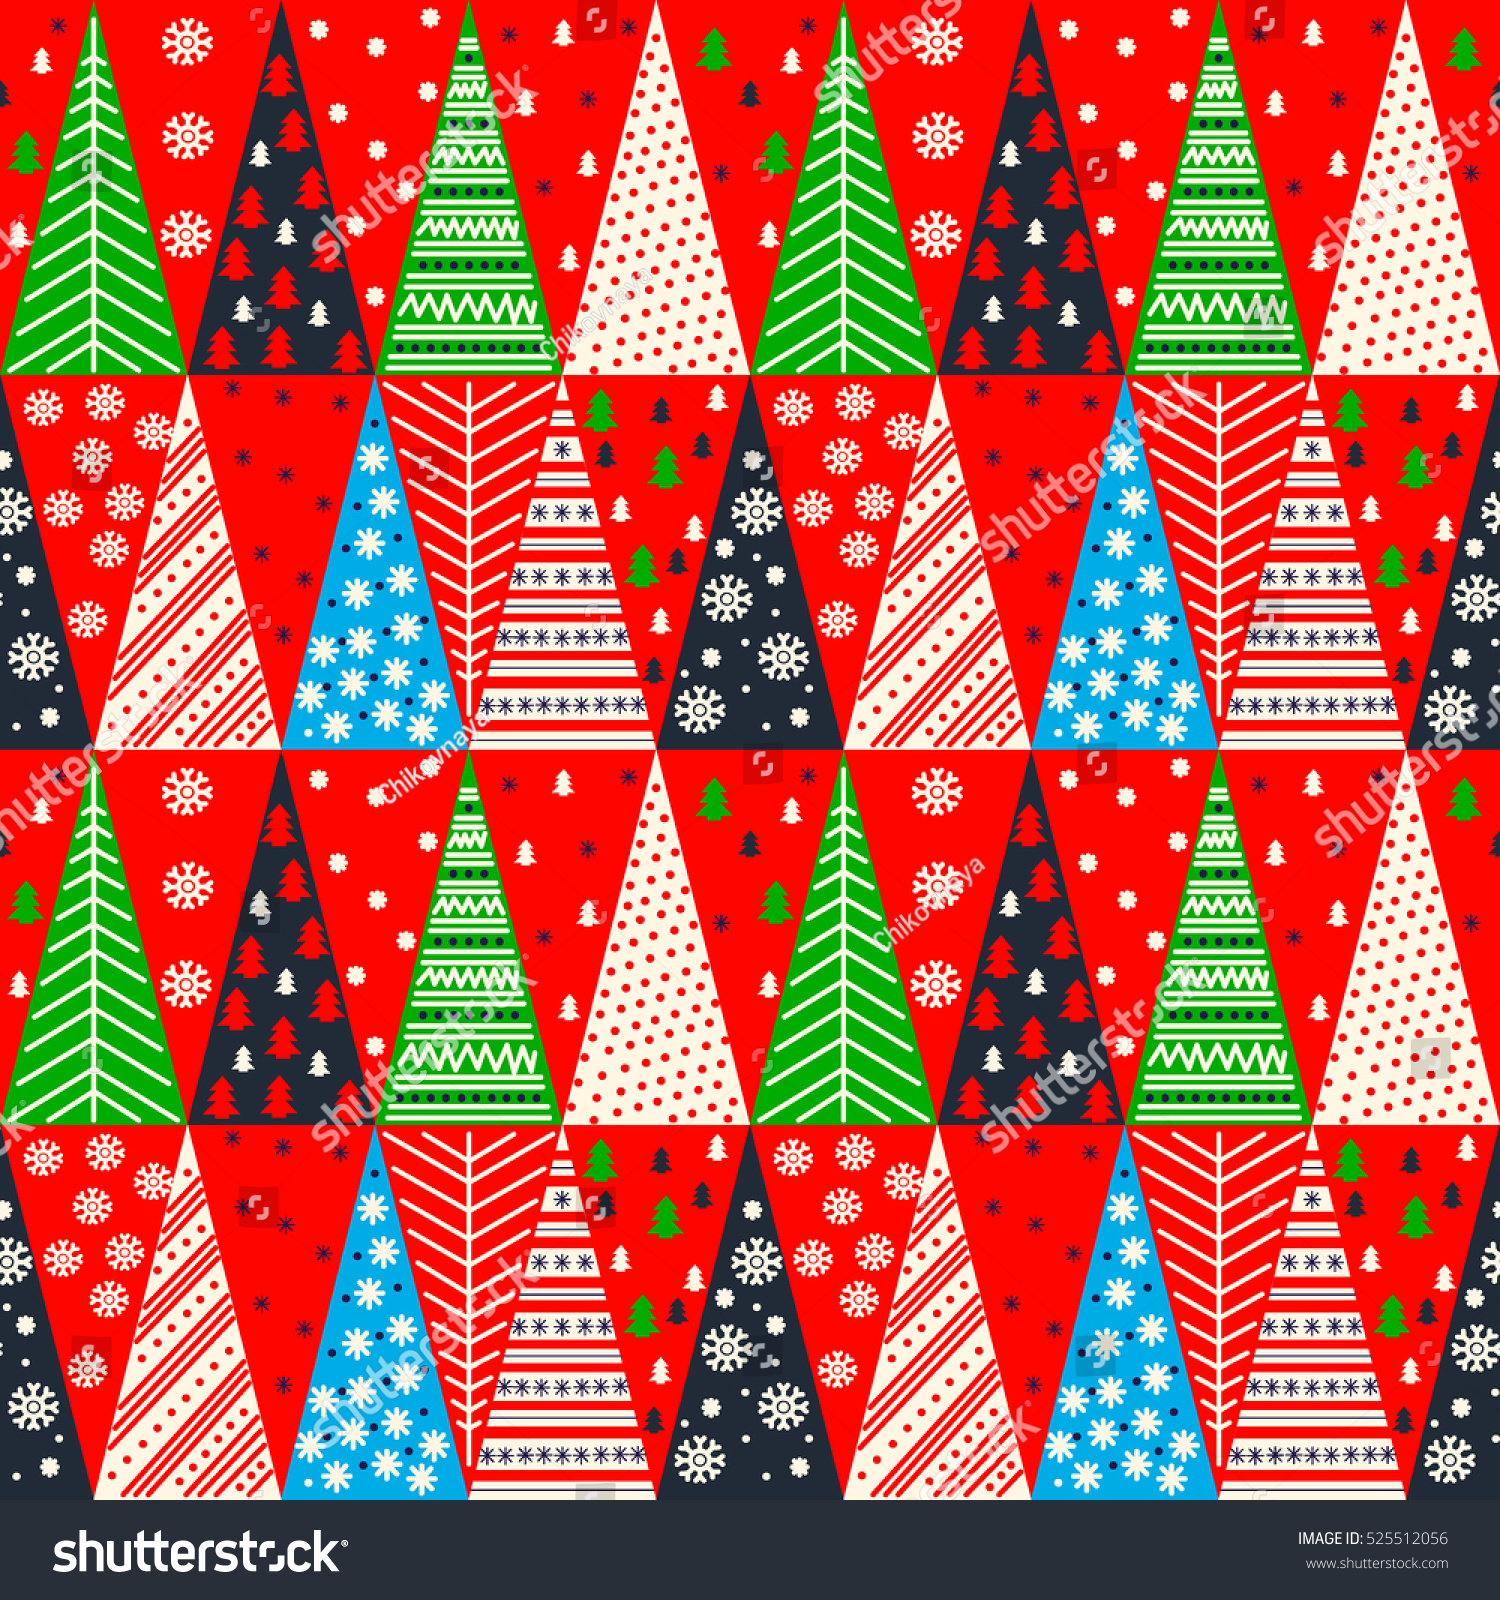 Pics photos merry christmas argyle twitter backgrounds - Merry Christmas Seamless Texture Pattern Vector